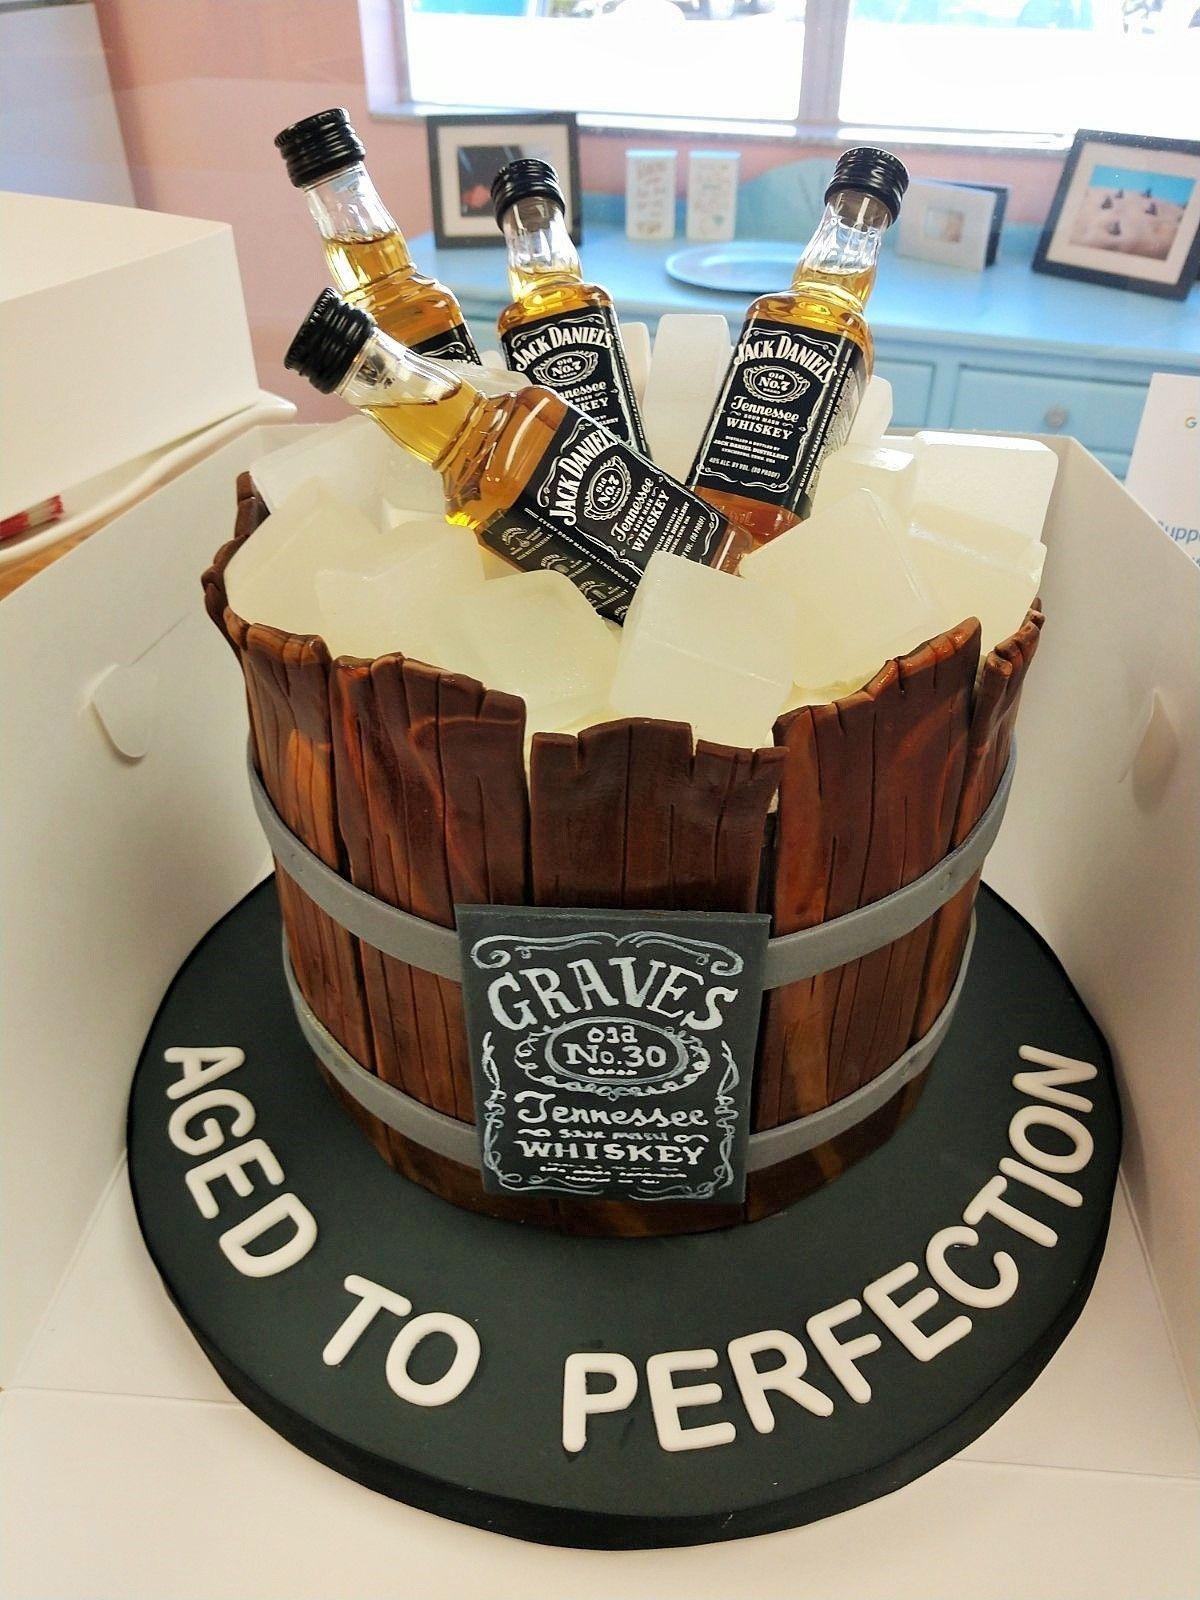 Mens Bday Cake Ideas In 2020 Birthday Cake For Him 30th Birthday Cakes For Men Funny Birthday Cakes